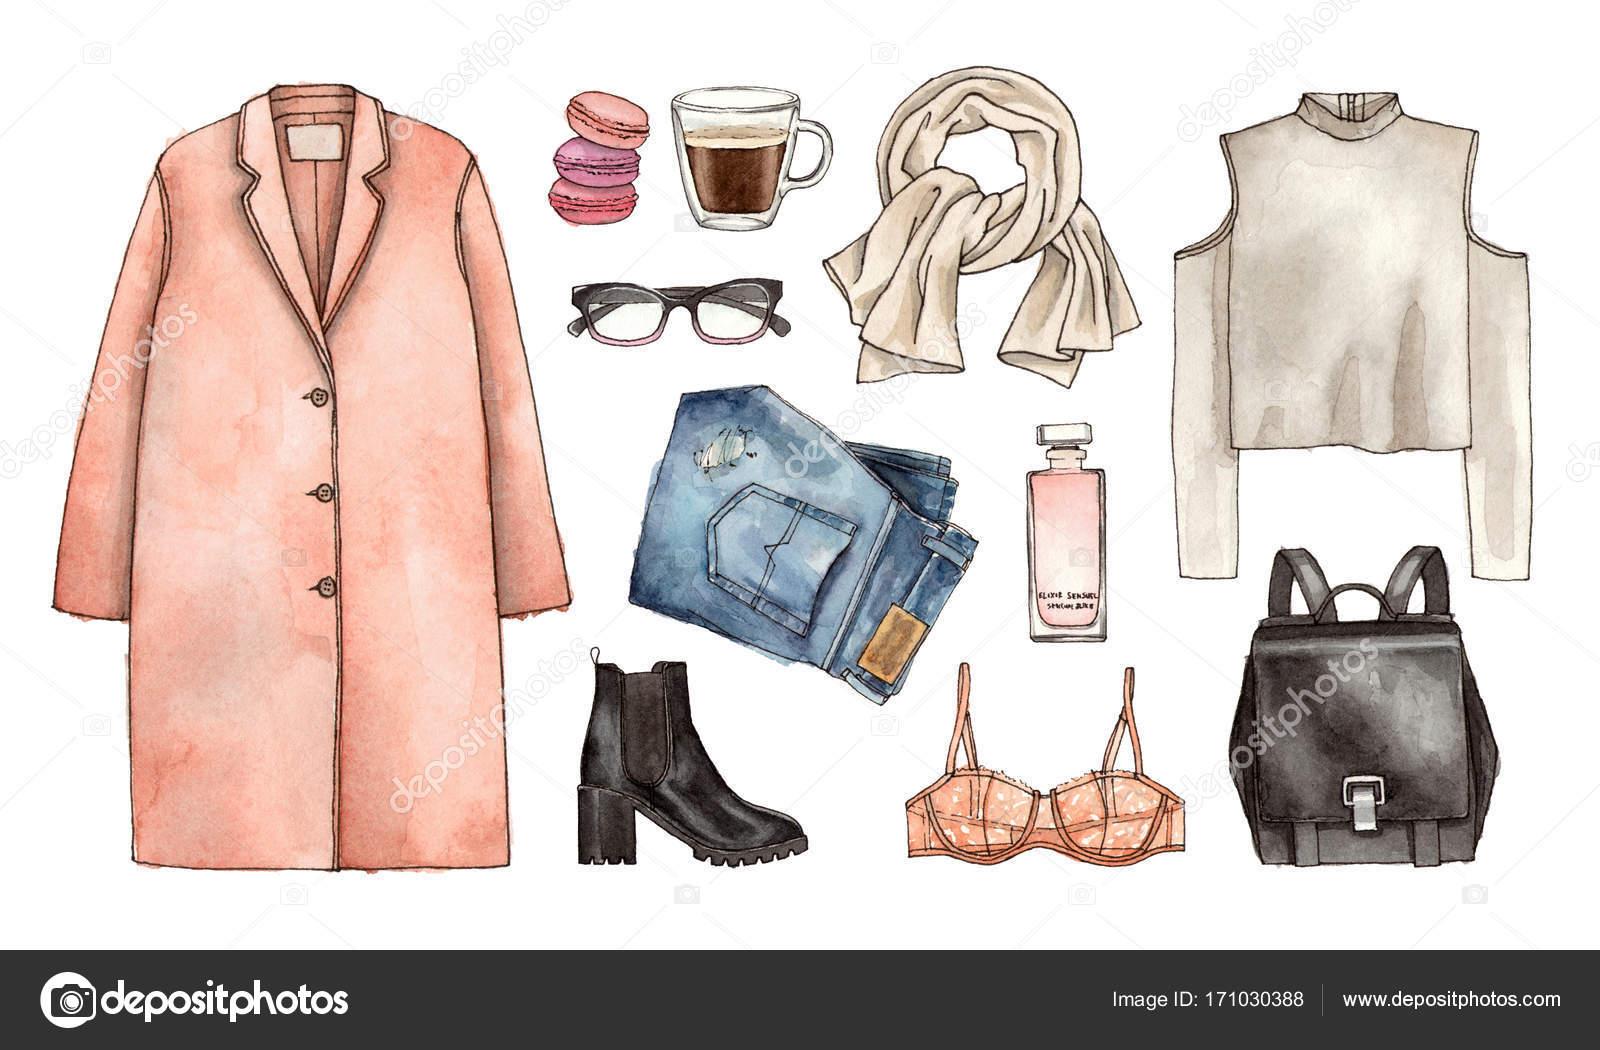 Kleding Fashion.Aquarel Hand Tekenen Schets Fashion Outfit Een Reeks Van Kleding En